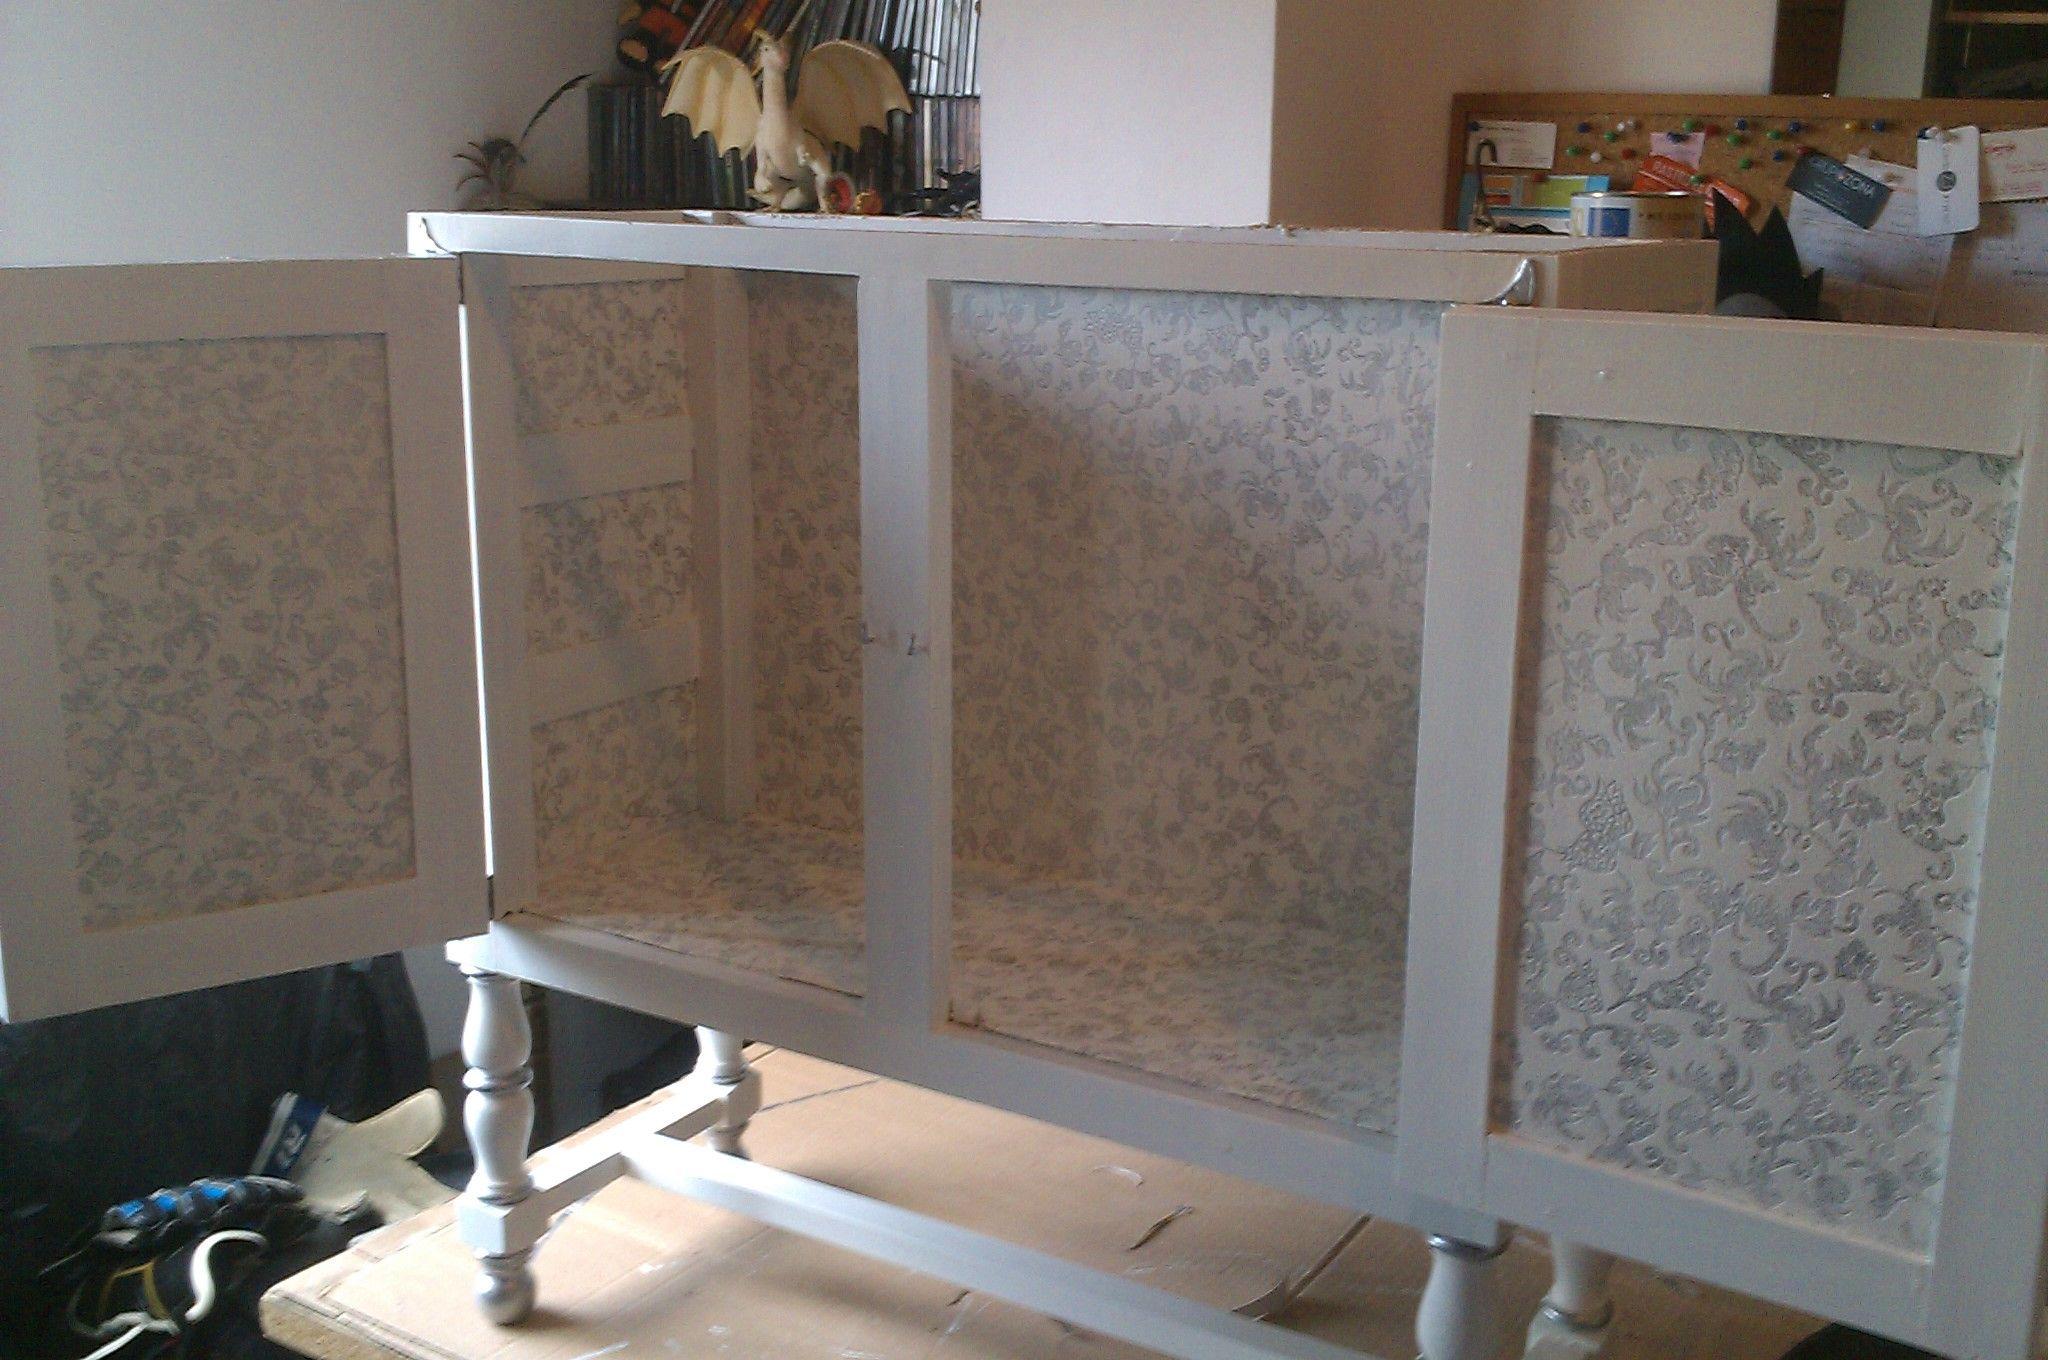 Interior de mueble con papel estilo franc s envejecido for Muebles estilo frances